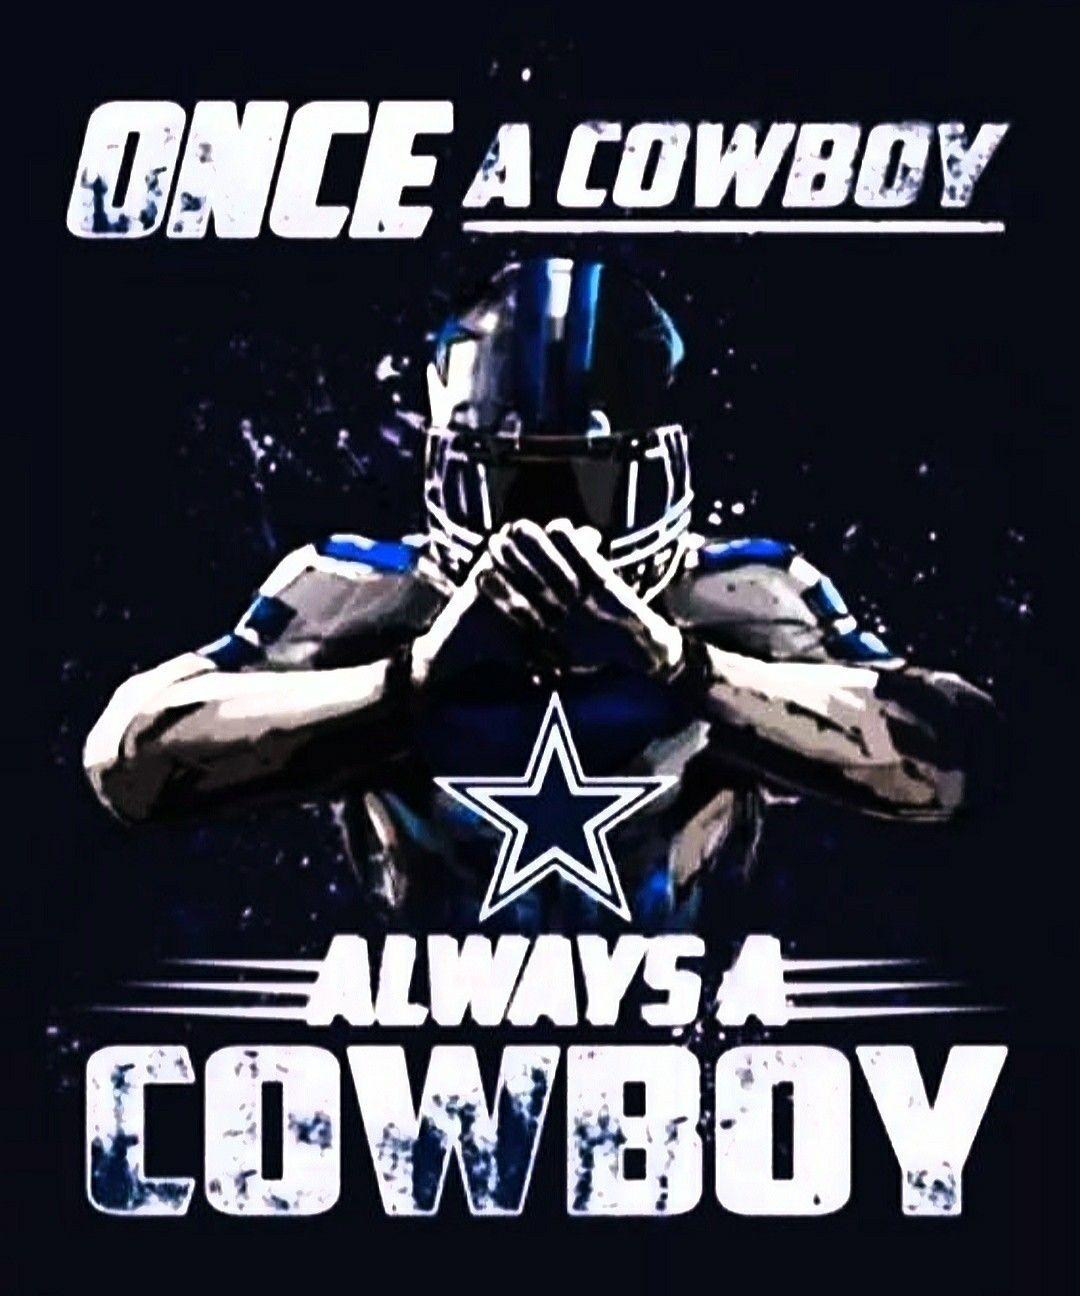 Pin By Shannon Beyer On Dallas Cowboys 4life Dallas Cowboys Memes Dallas Cowboys Pictures Dallas Cowboys Logo